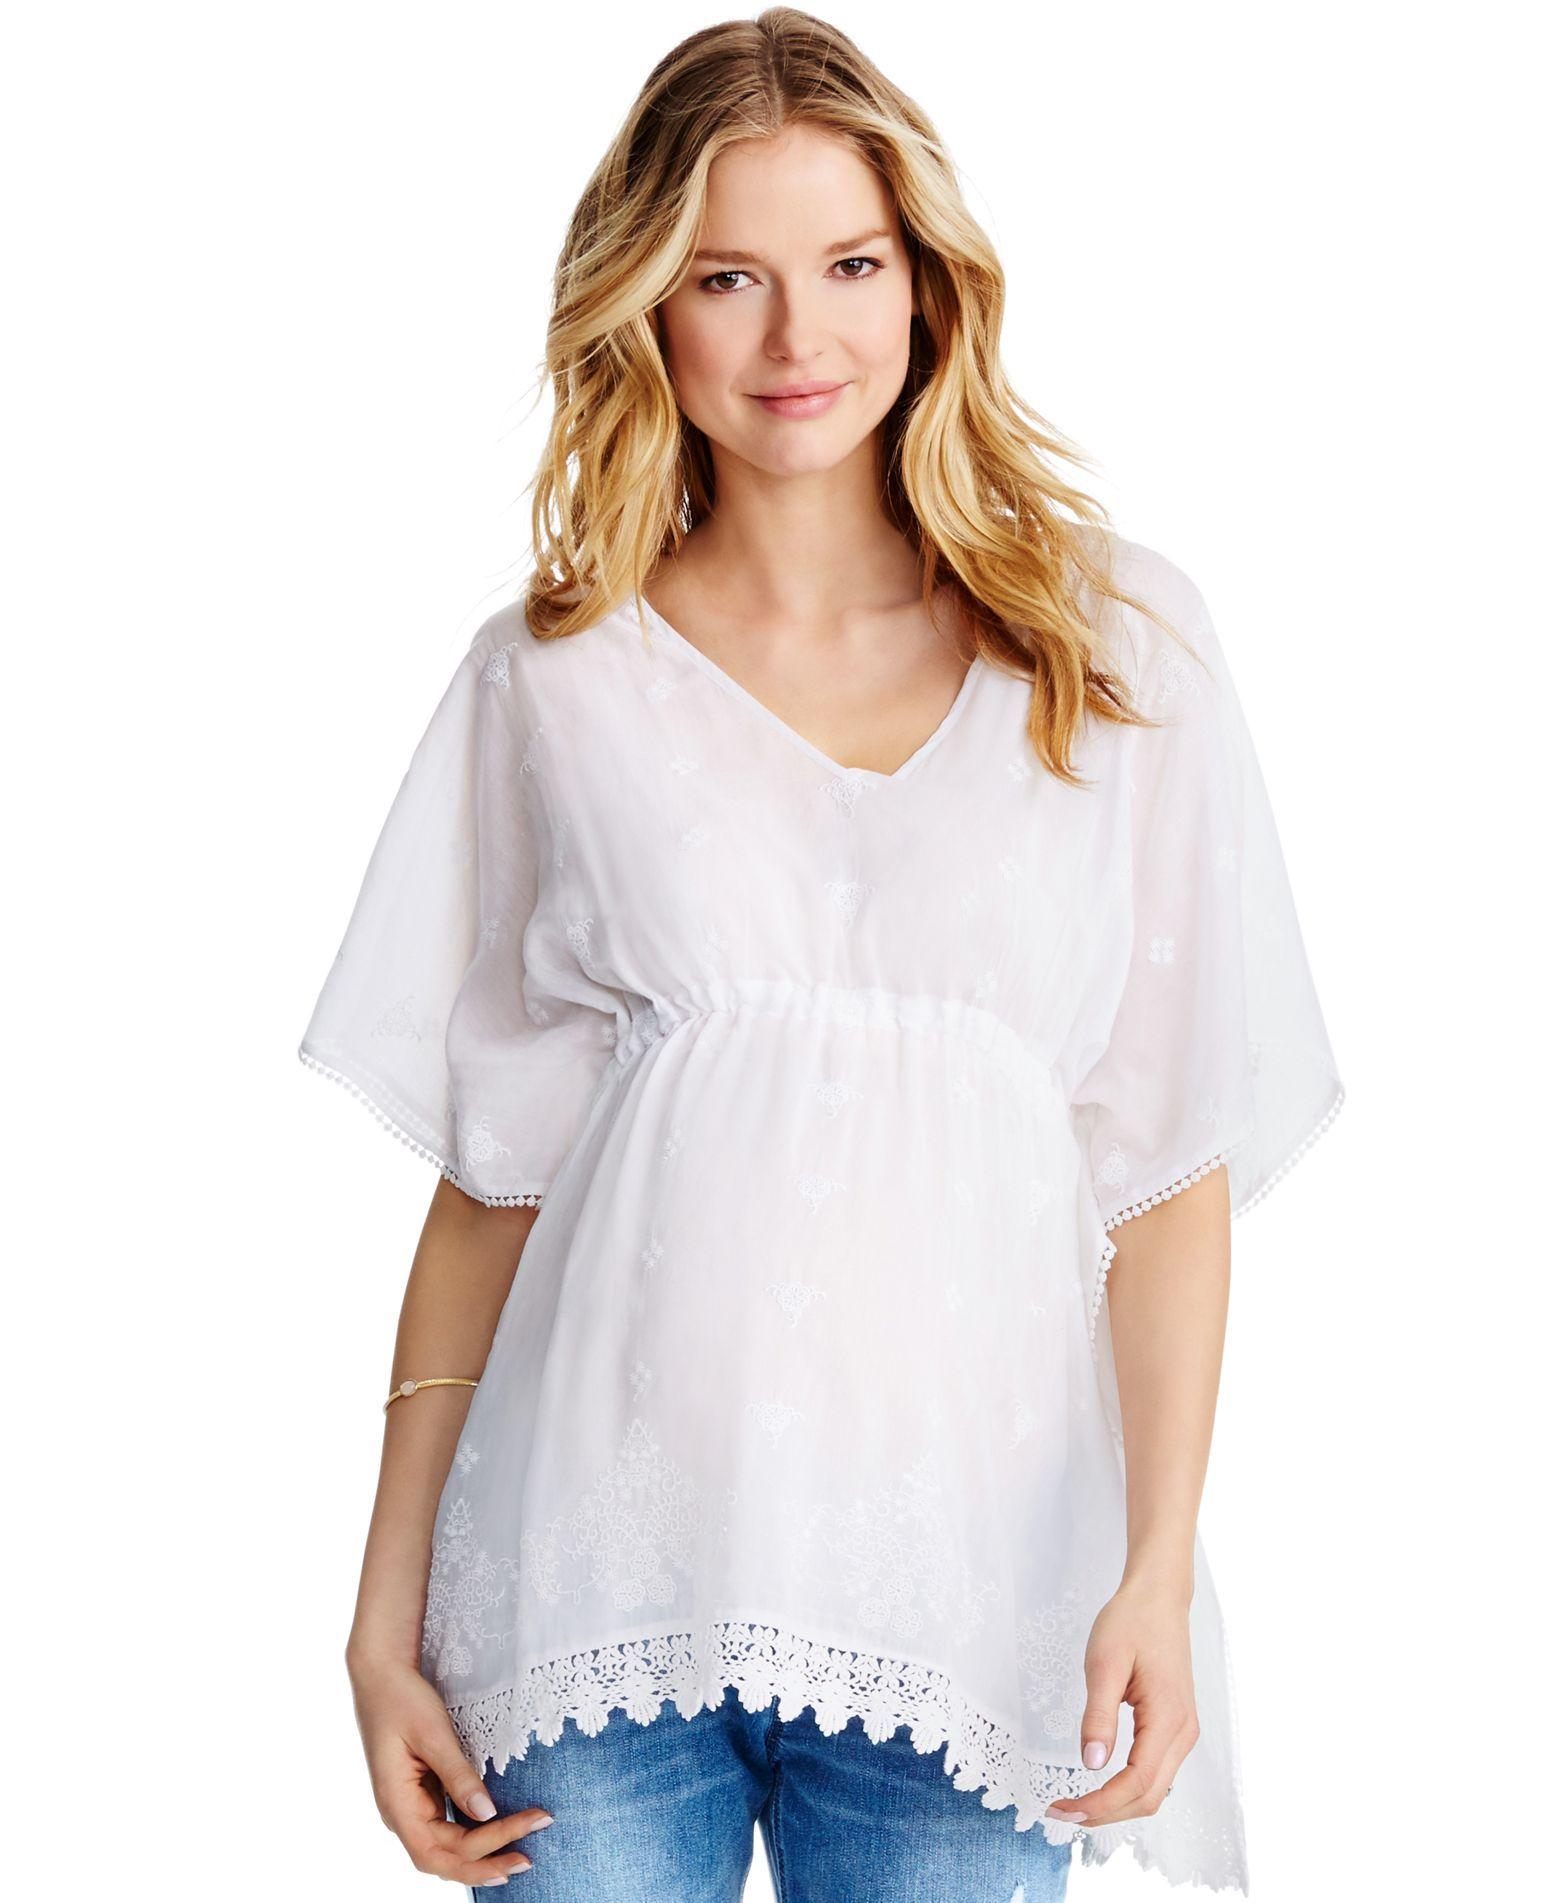 Jessica simpson maternity lace trim peasant blouse products jessica simpson maternity lace trim peasant blouse ombrellifo Gallery